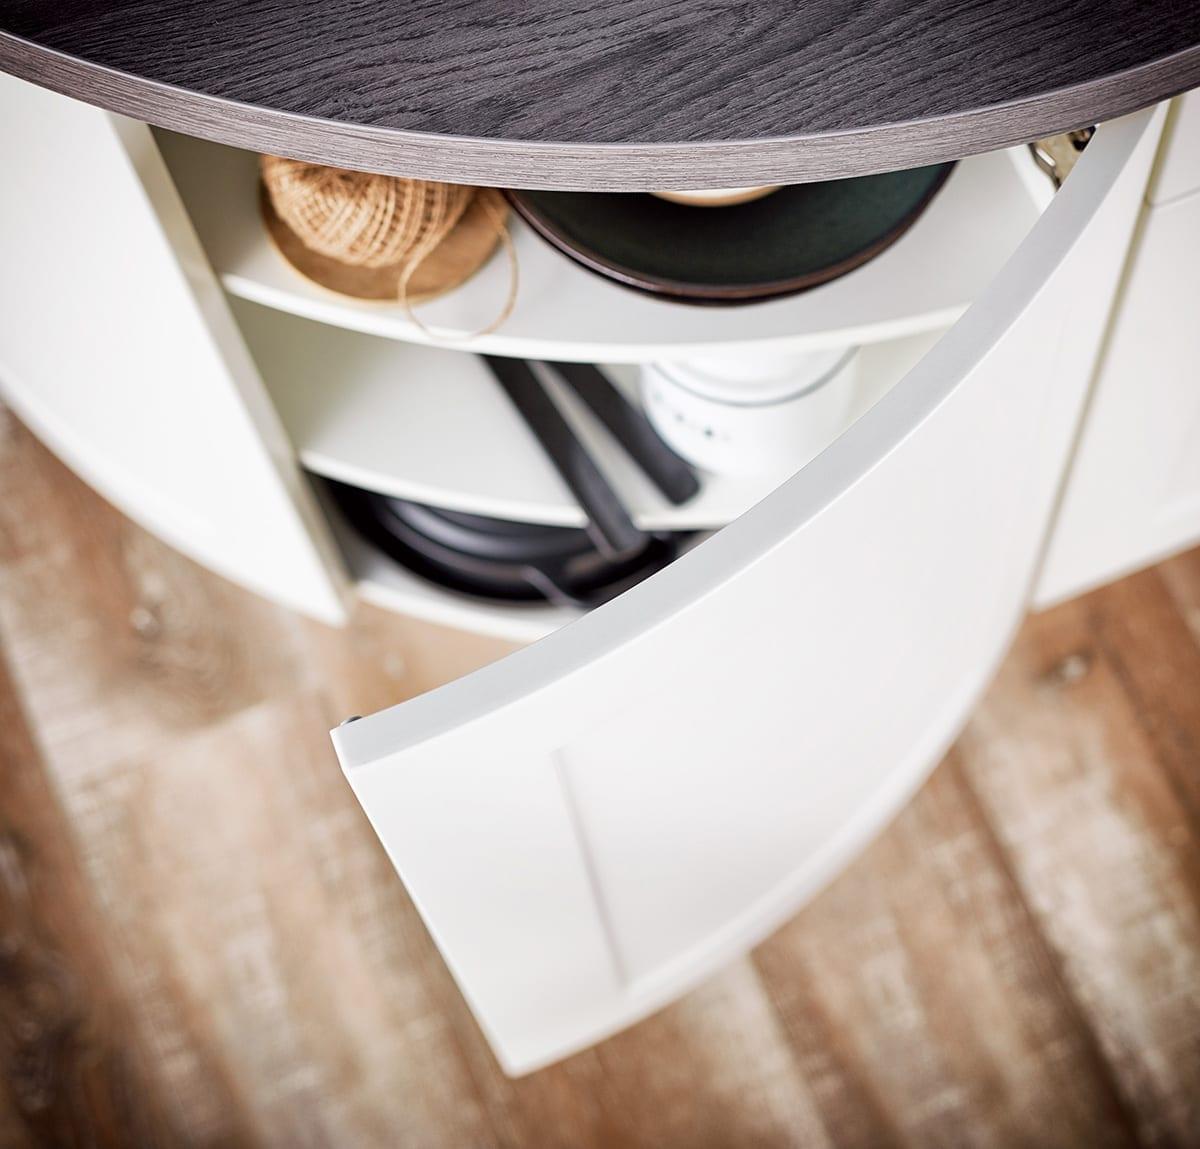 Lotus Curved Shaker Kitchen Doors | Alm Studios